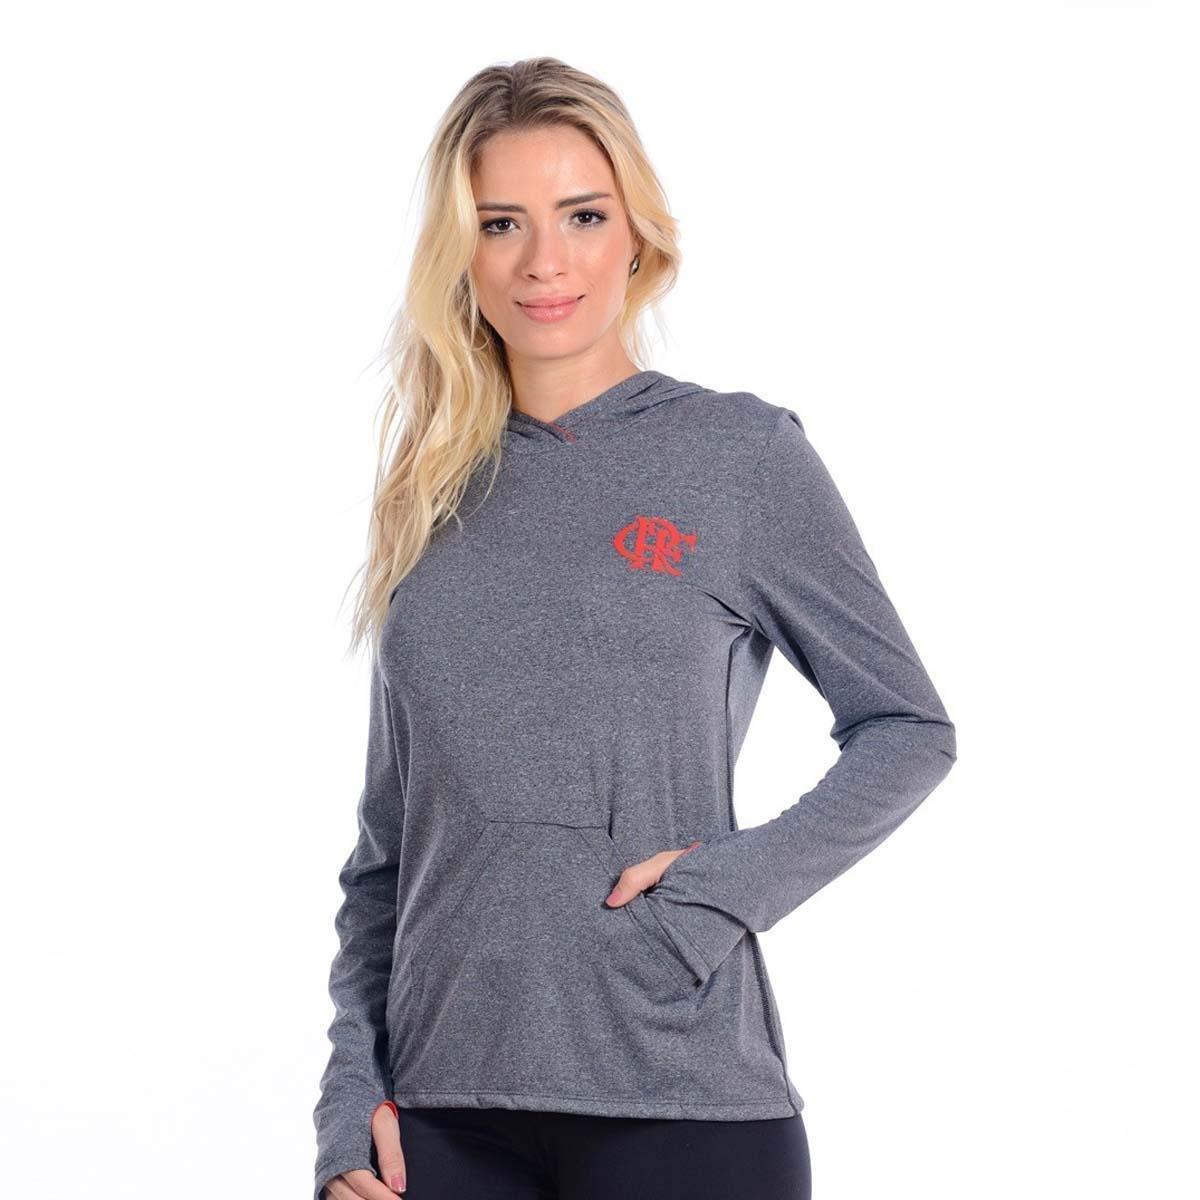 Camisa Flamengo ML Capuk Feminina Braziline - Compre Agora  4b18f52471d3b